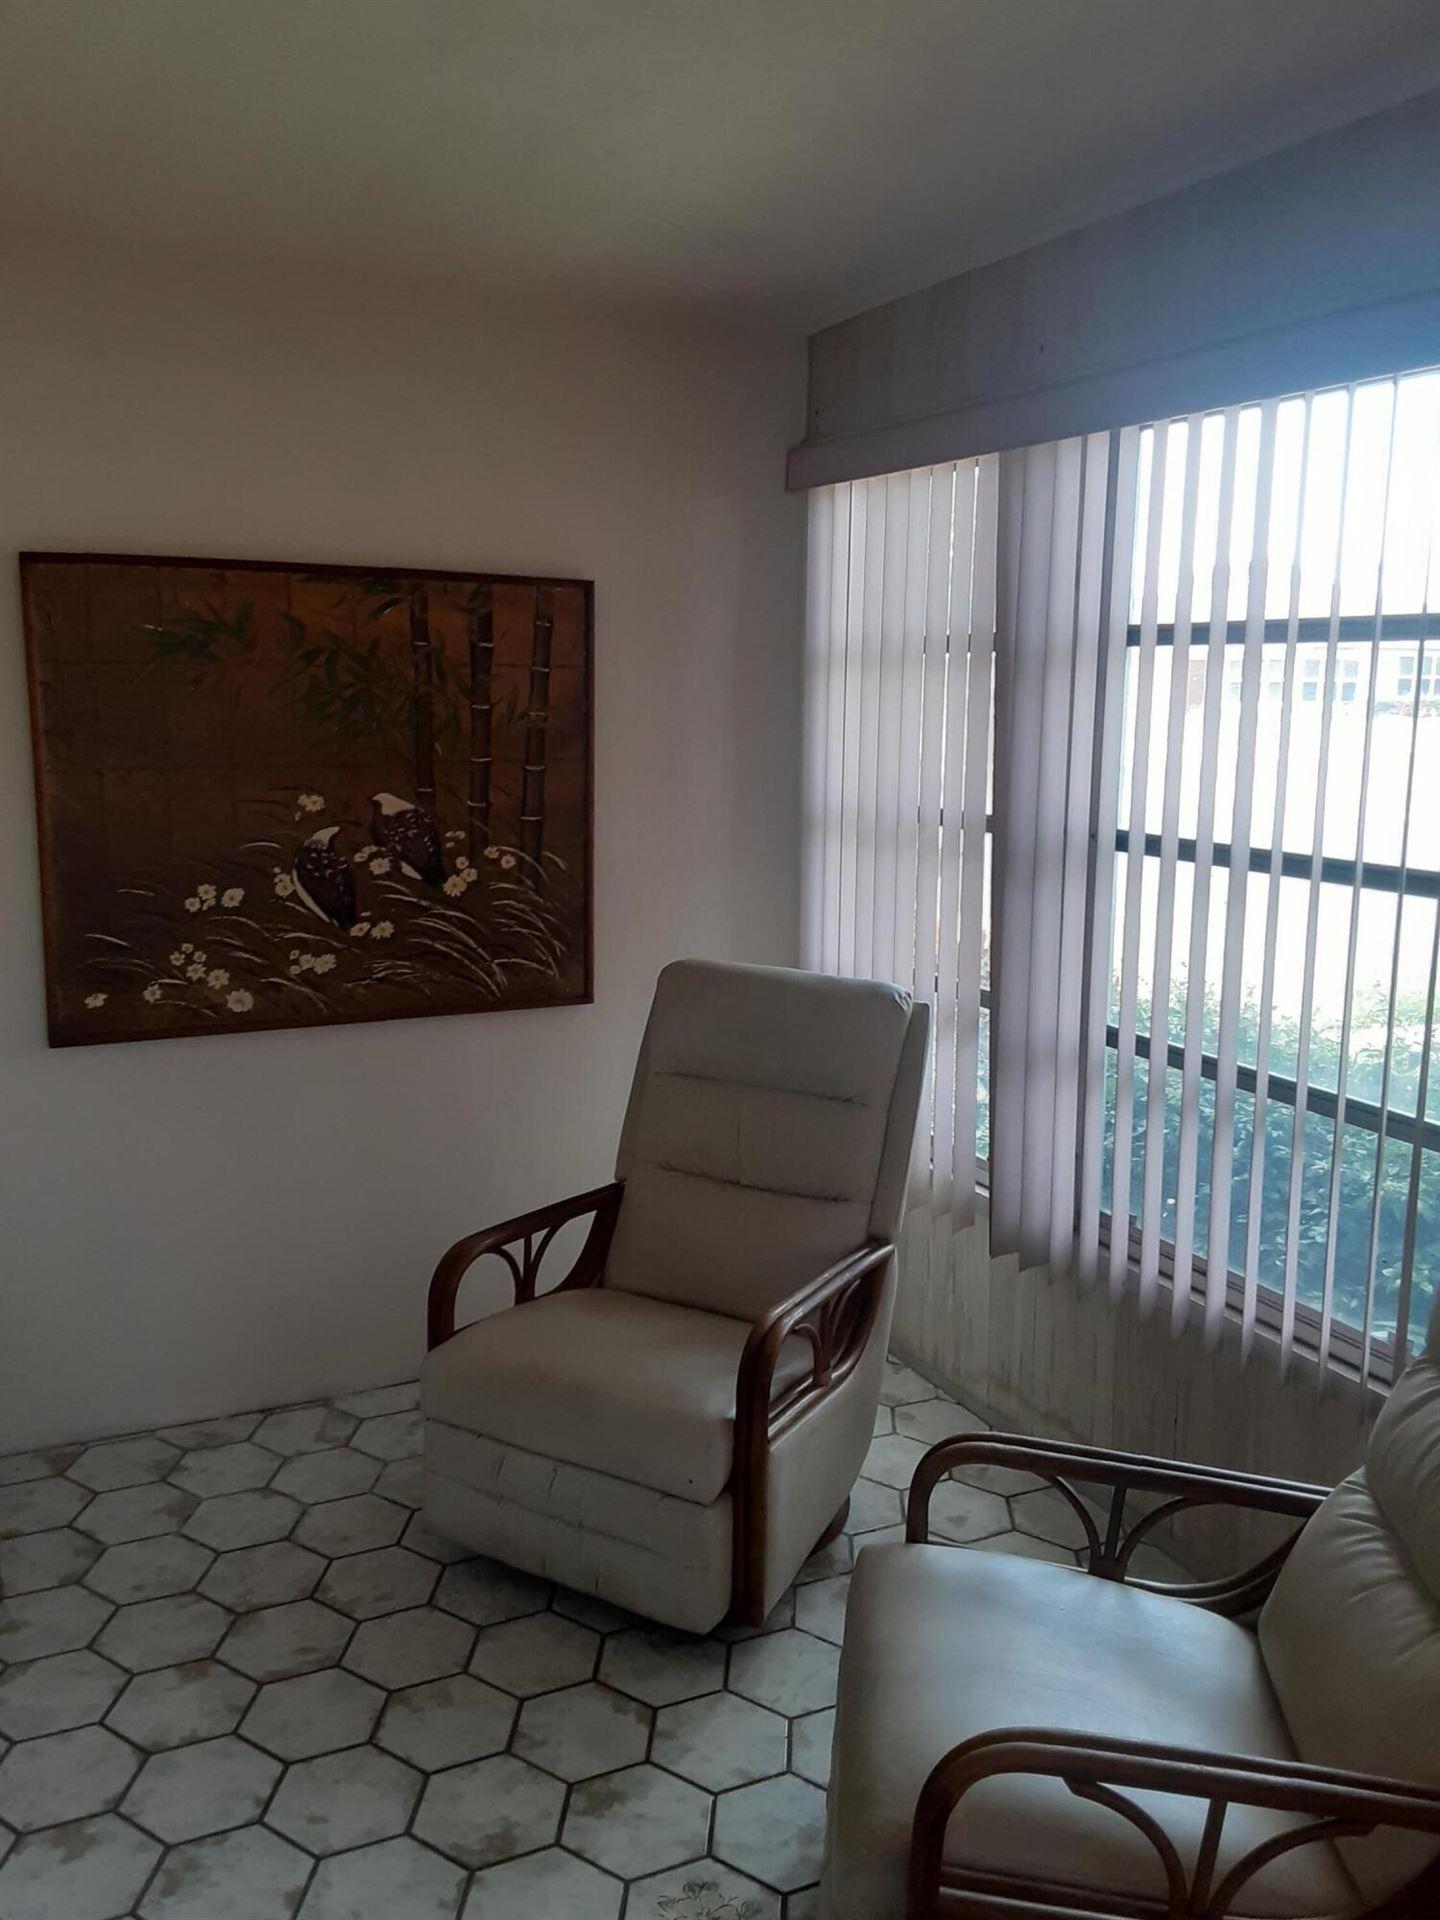 Photo of 4580 NW 3rd Street #C, Delray Beach, FL 33445 (MLS # RX-10732853)